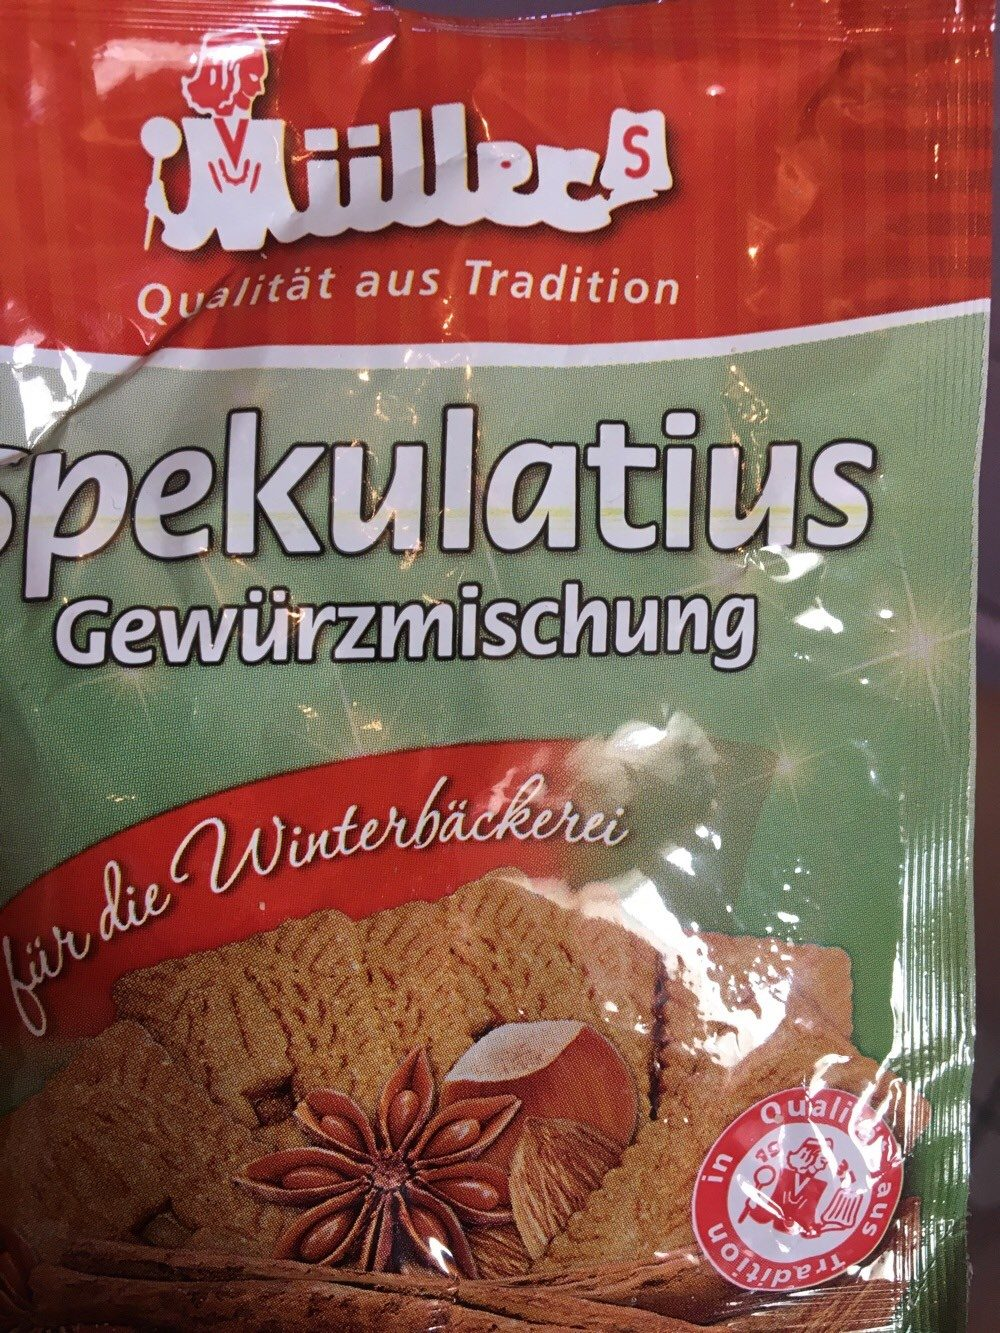 Spekulatius Gewürzmischung - Produit